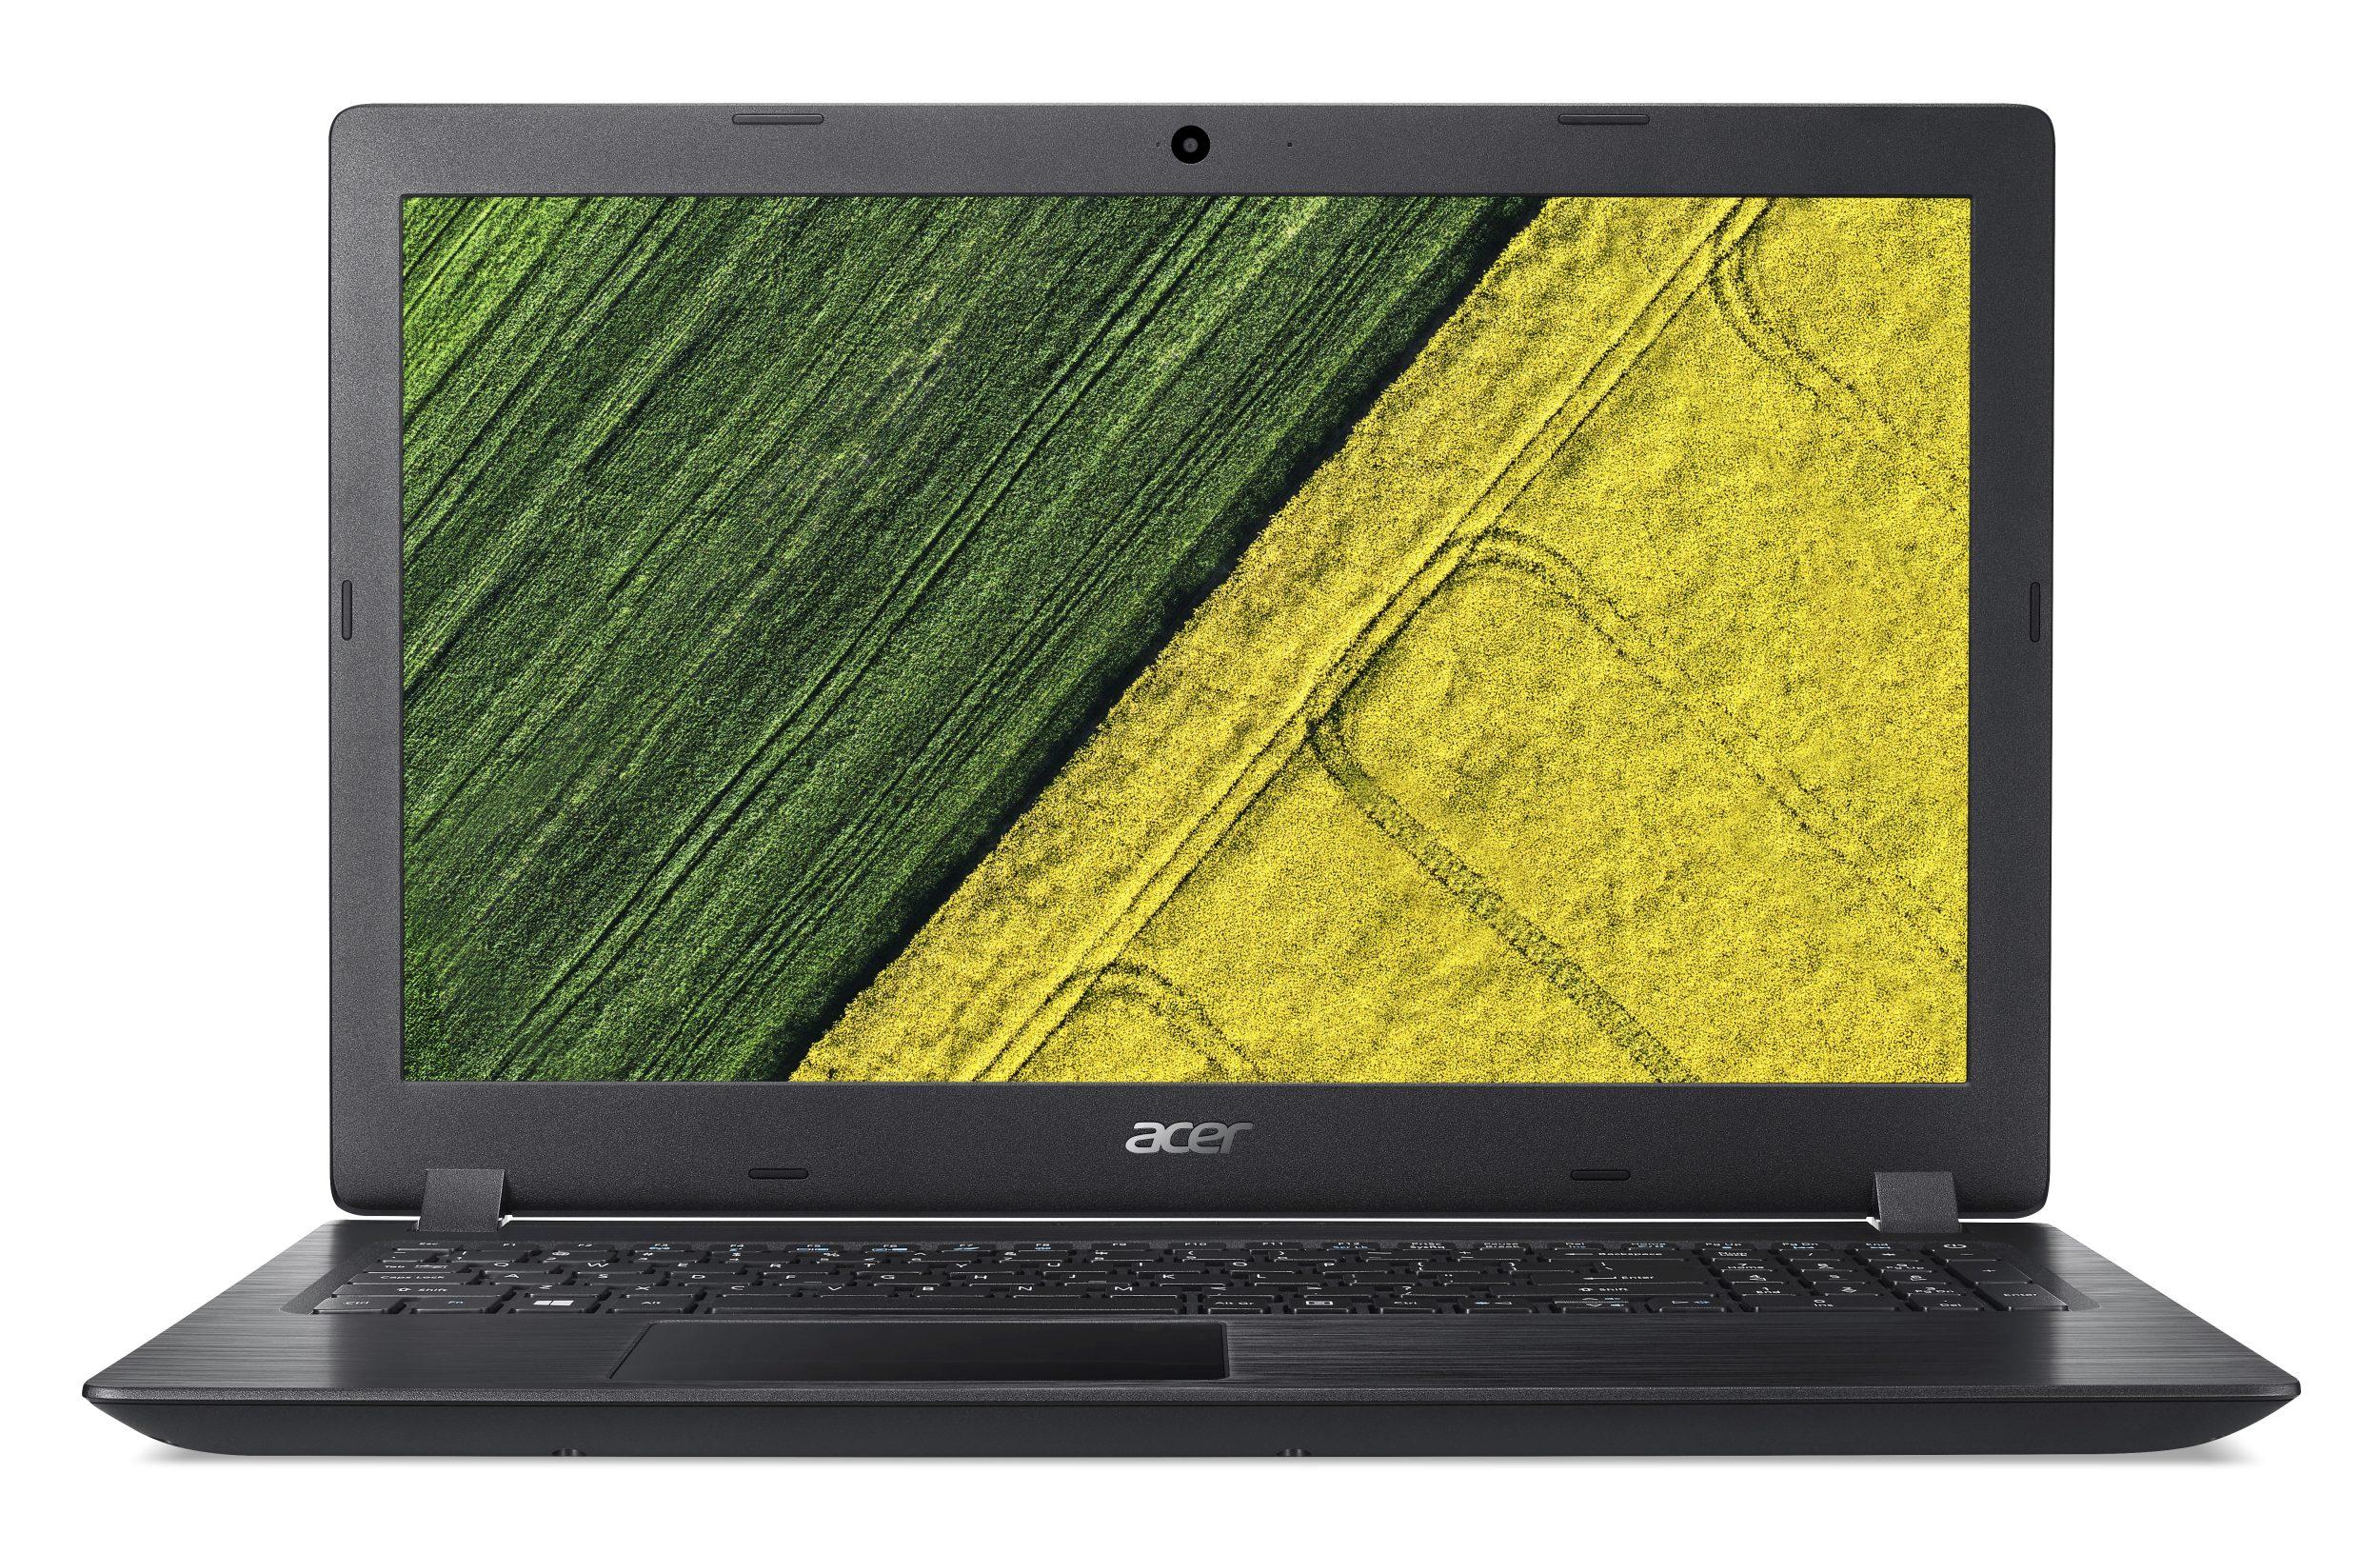 "Acer Aspire 3 (A315-21G-44FZ) AMD A4-9120/4GB+4GB/1TB/Radeon 520 2GB/15.6"" HD matný/BT/W10 Home/Black"